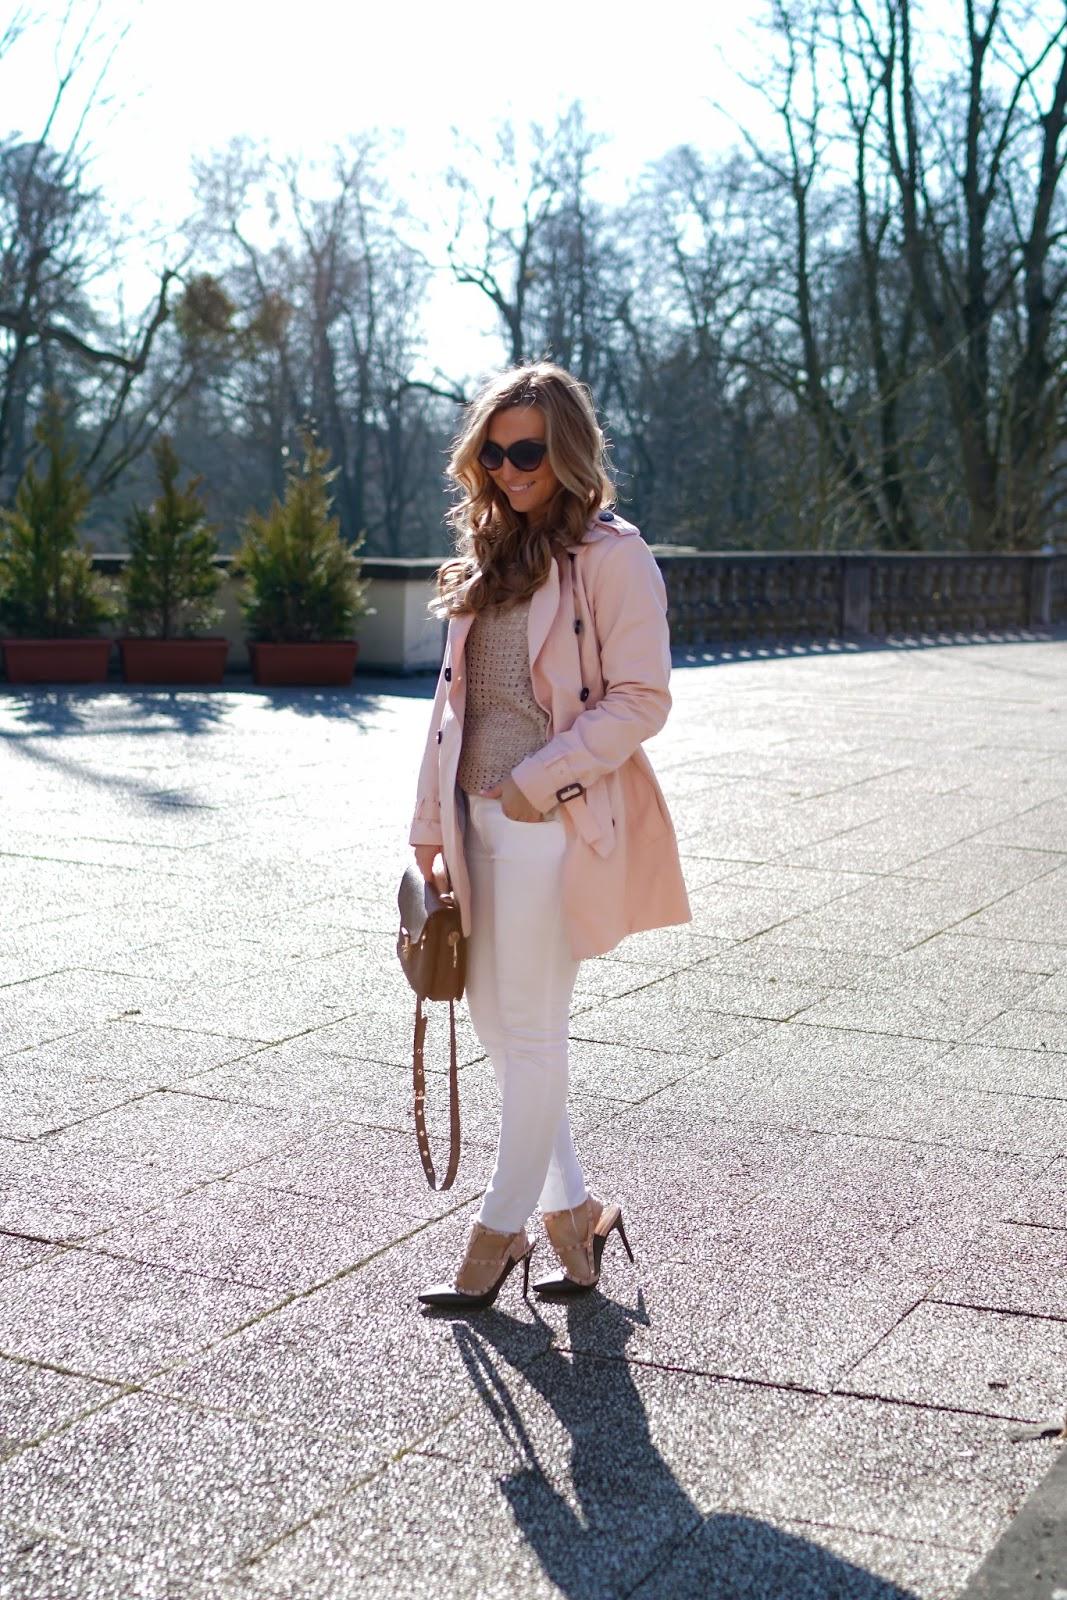 Fashionstylebyjohanna-streetone-Pastellfarbener-Trenchcoat-Frühlingslook-Blogger-Trend-Trendjacke-was-ist-aktuell-angesagt-trenchcoat-fashionstylebyjohanna-blogger-aus-frankfurt